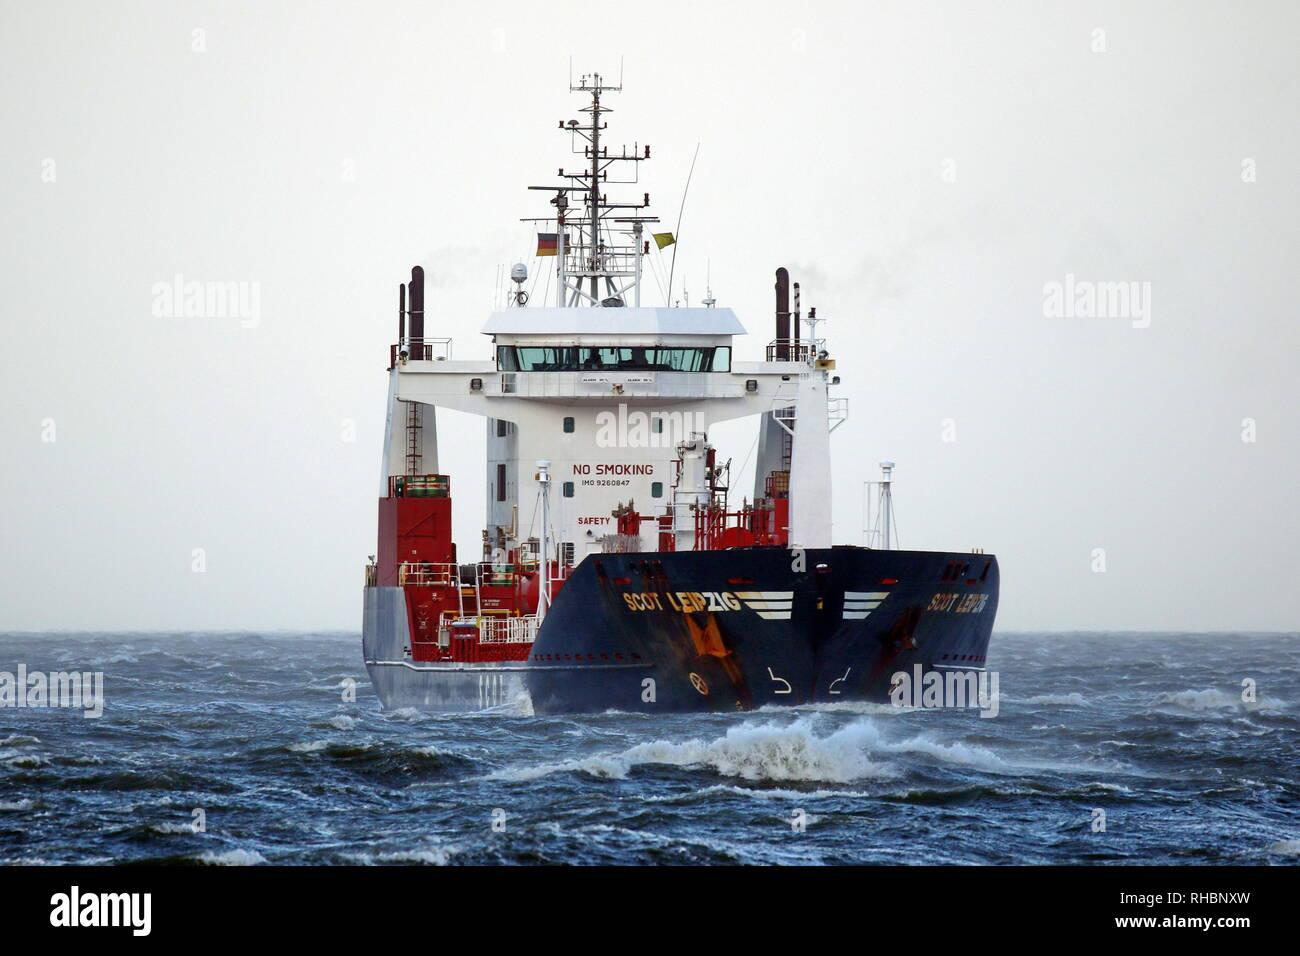 The tanker Scot Leipzig happened on 1 January 2019 Cuxhaven direction Hamburg. - Stock Image